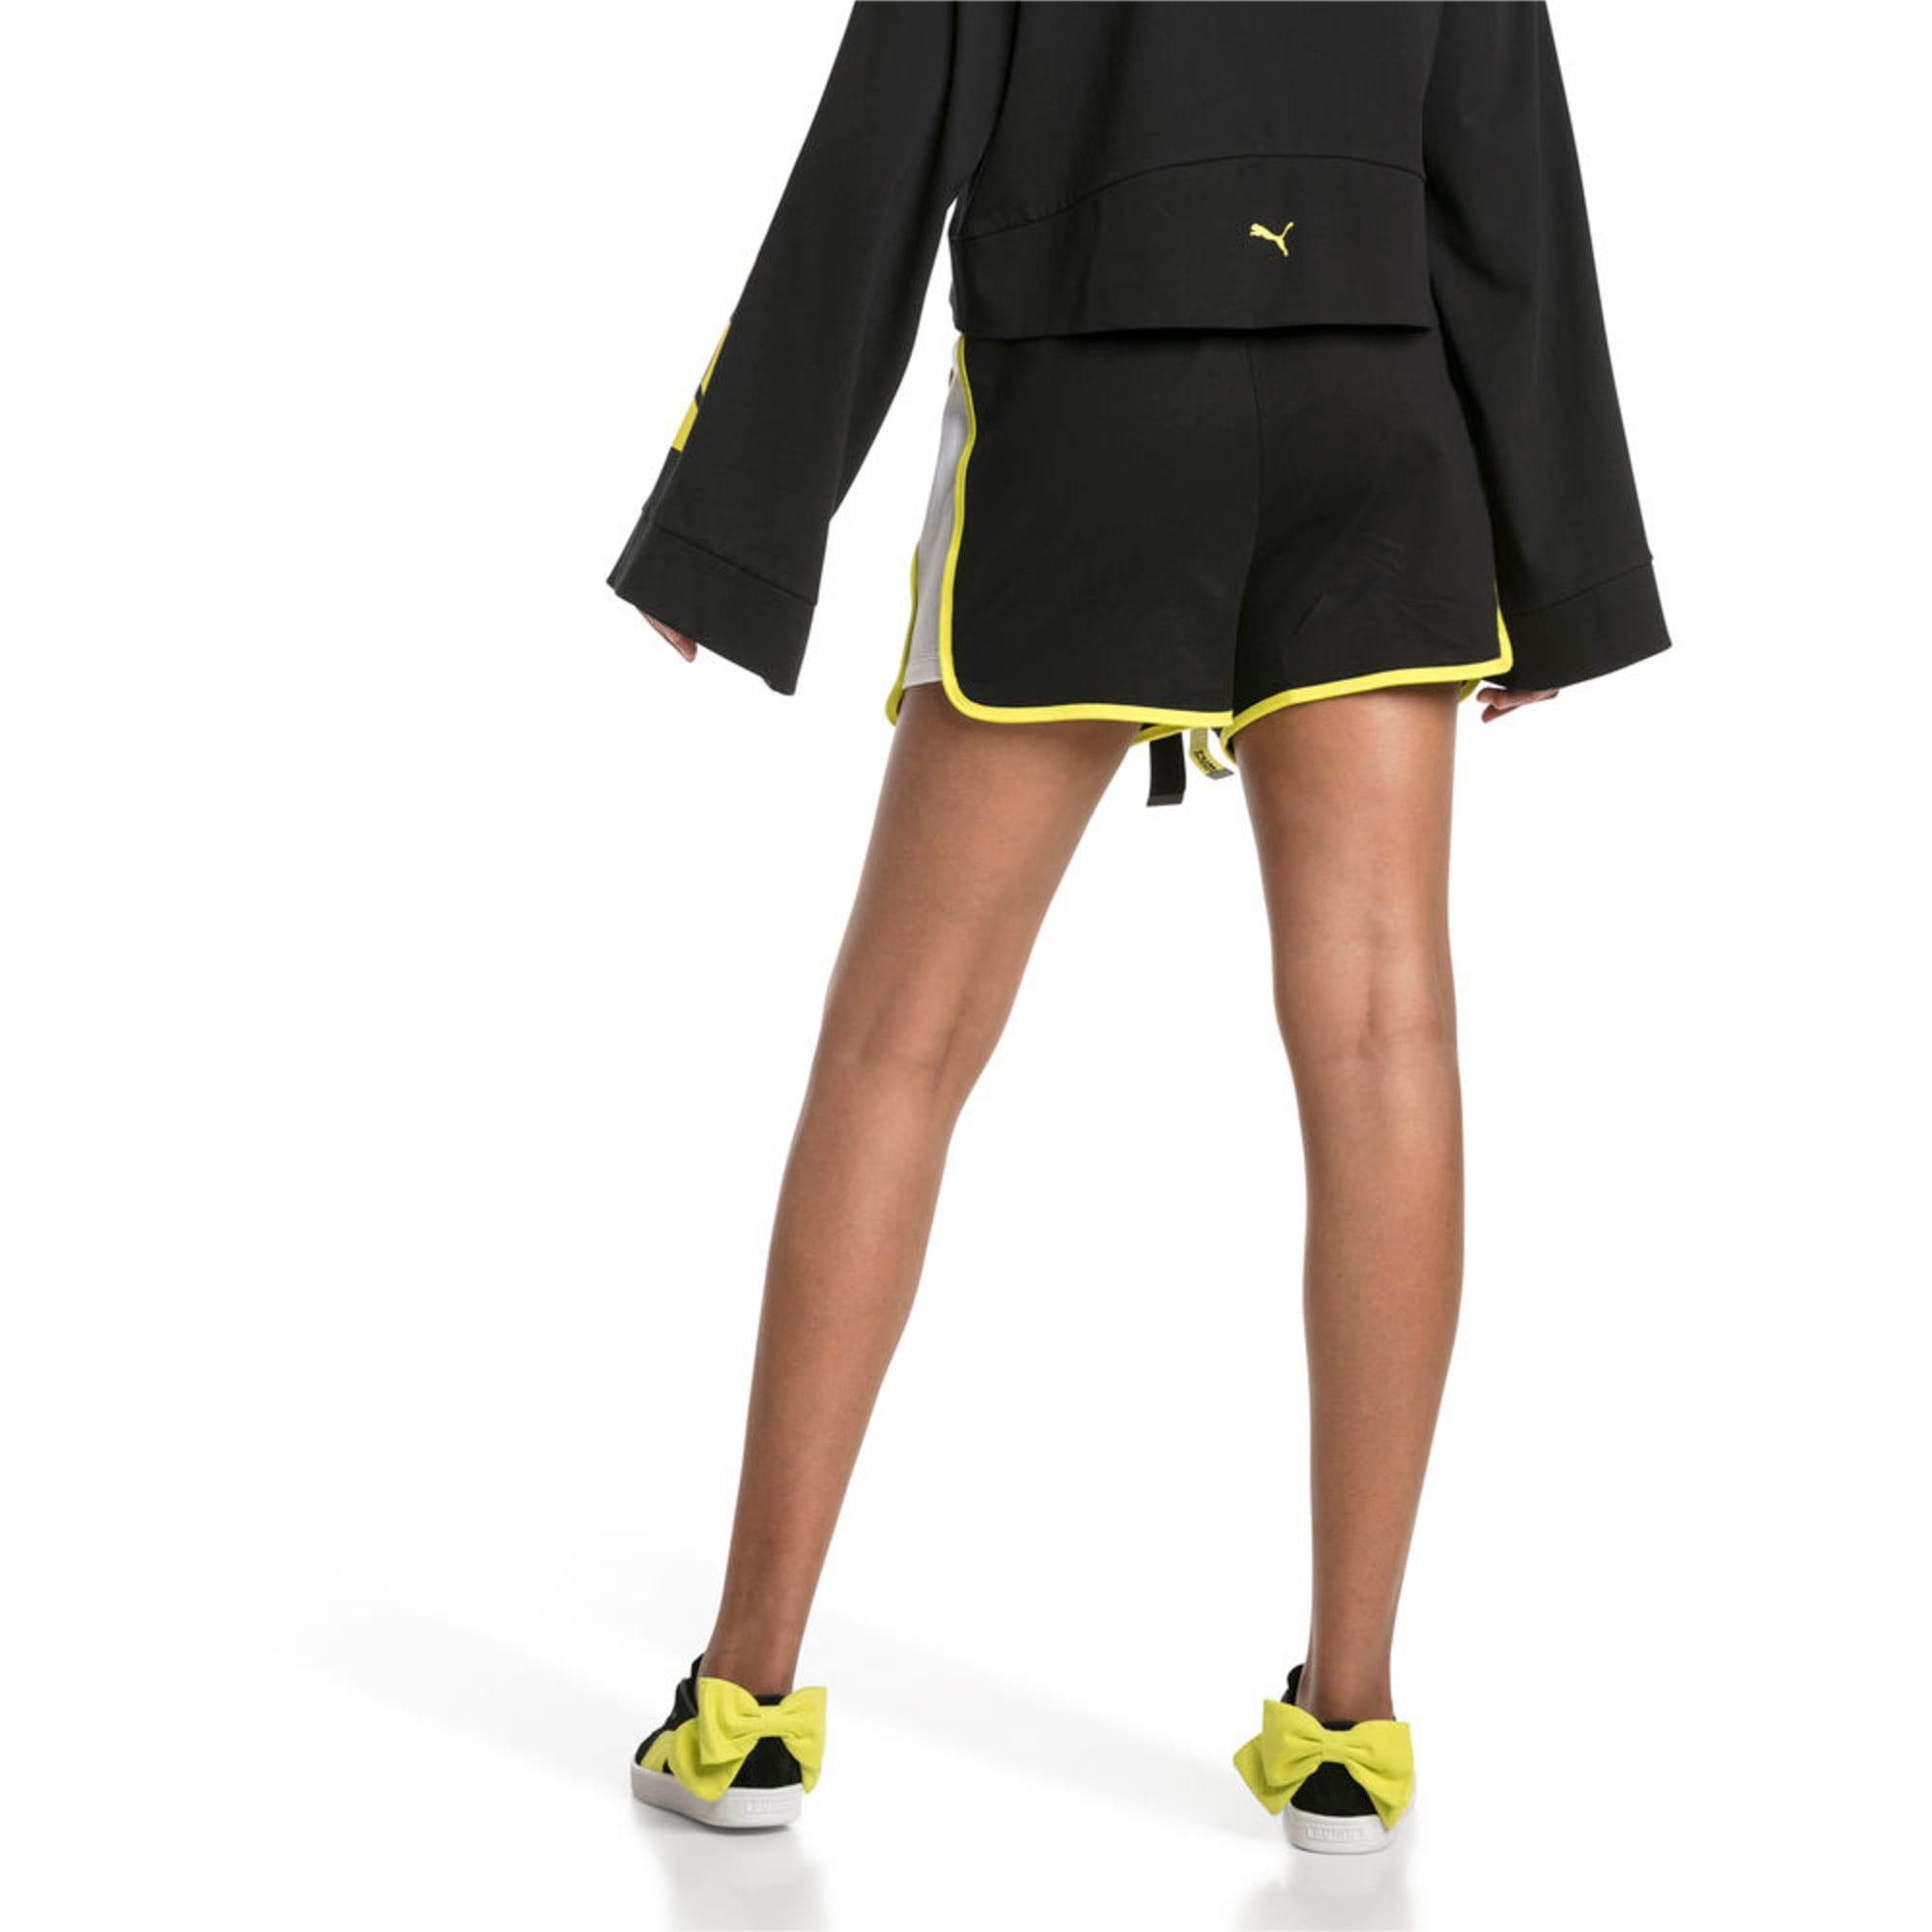 Thumbnail 1 of Archive Women's Xtreme Tape Highwaist Shorts, Cotton Black, medium-IND